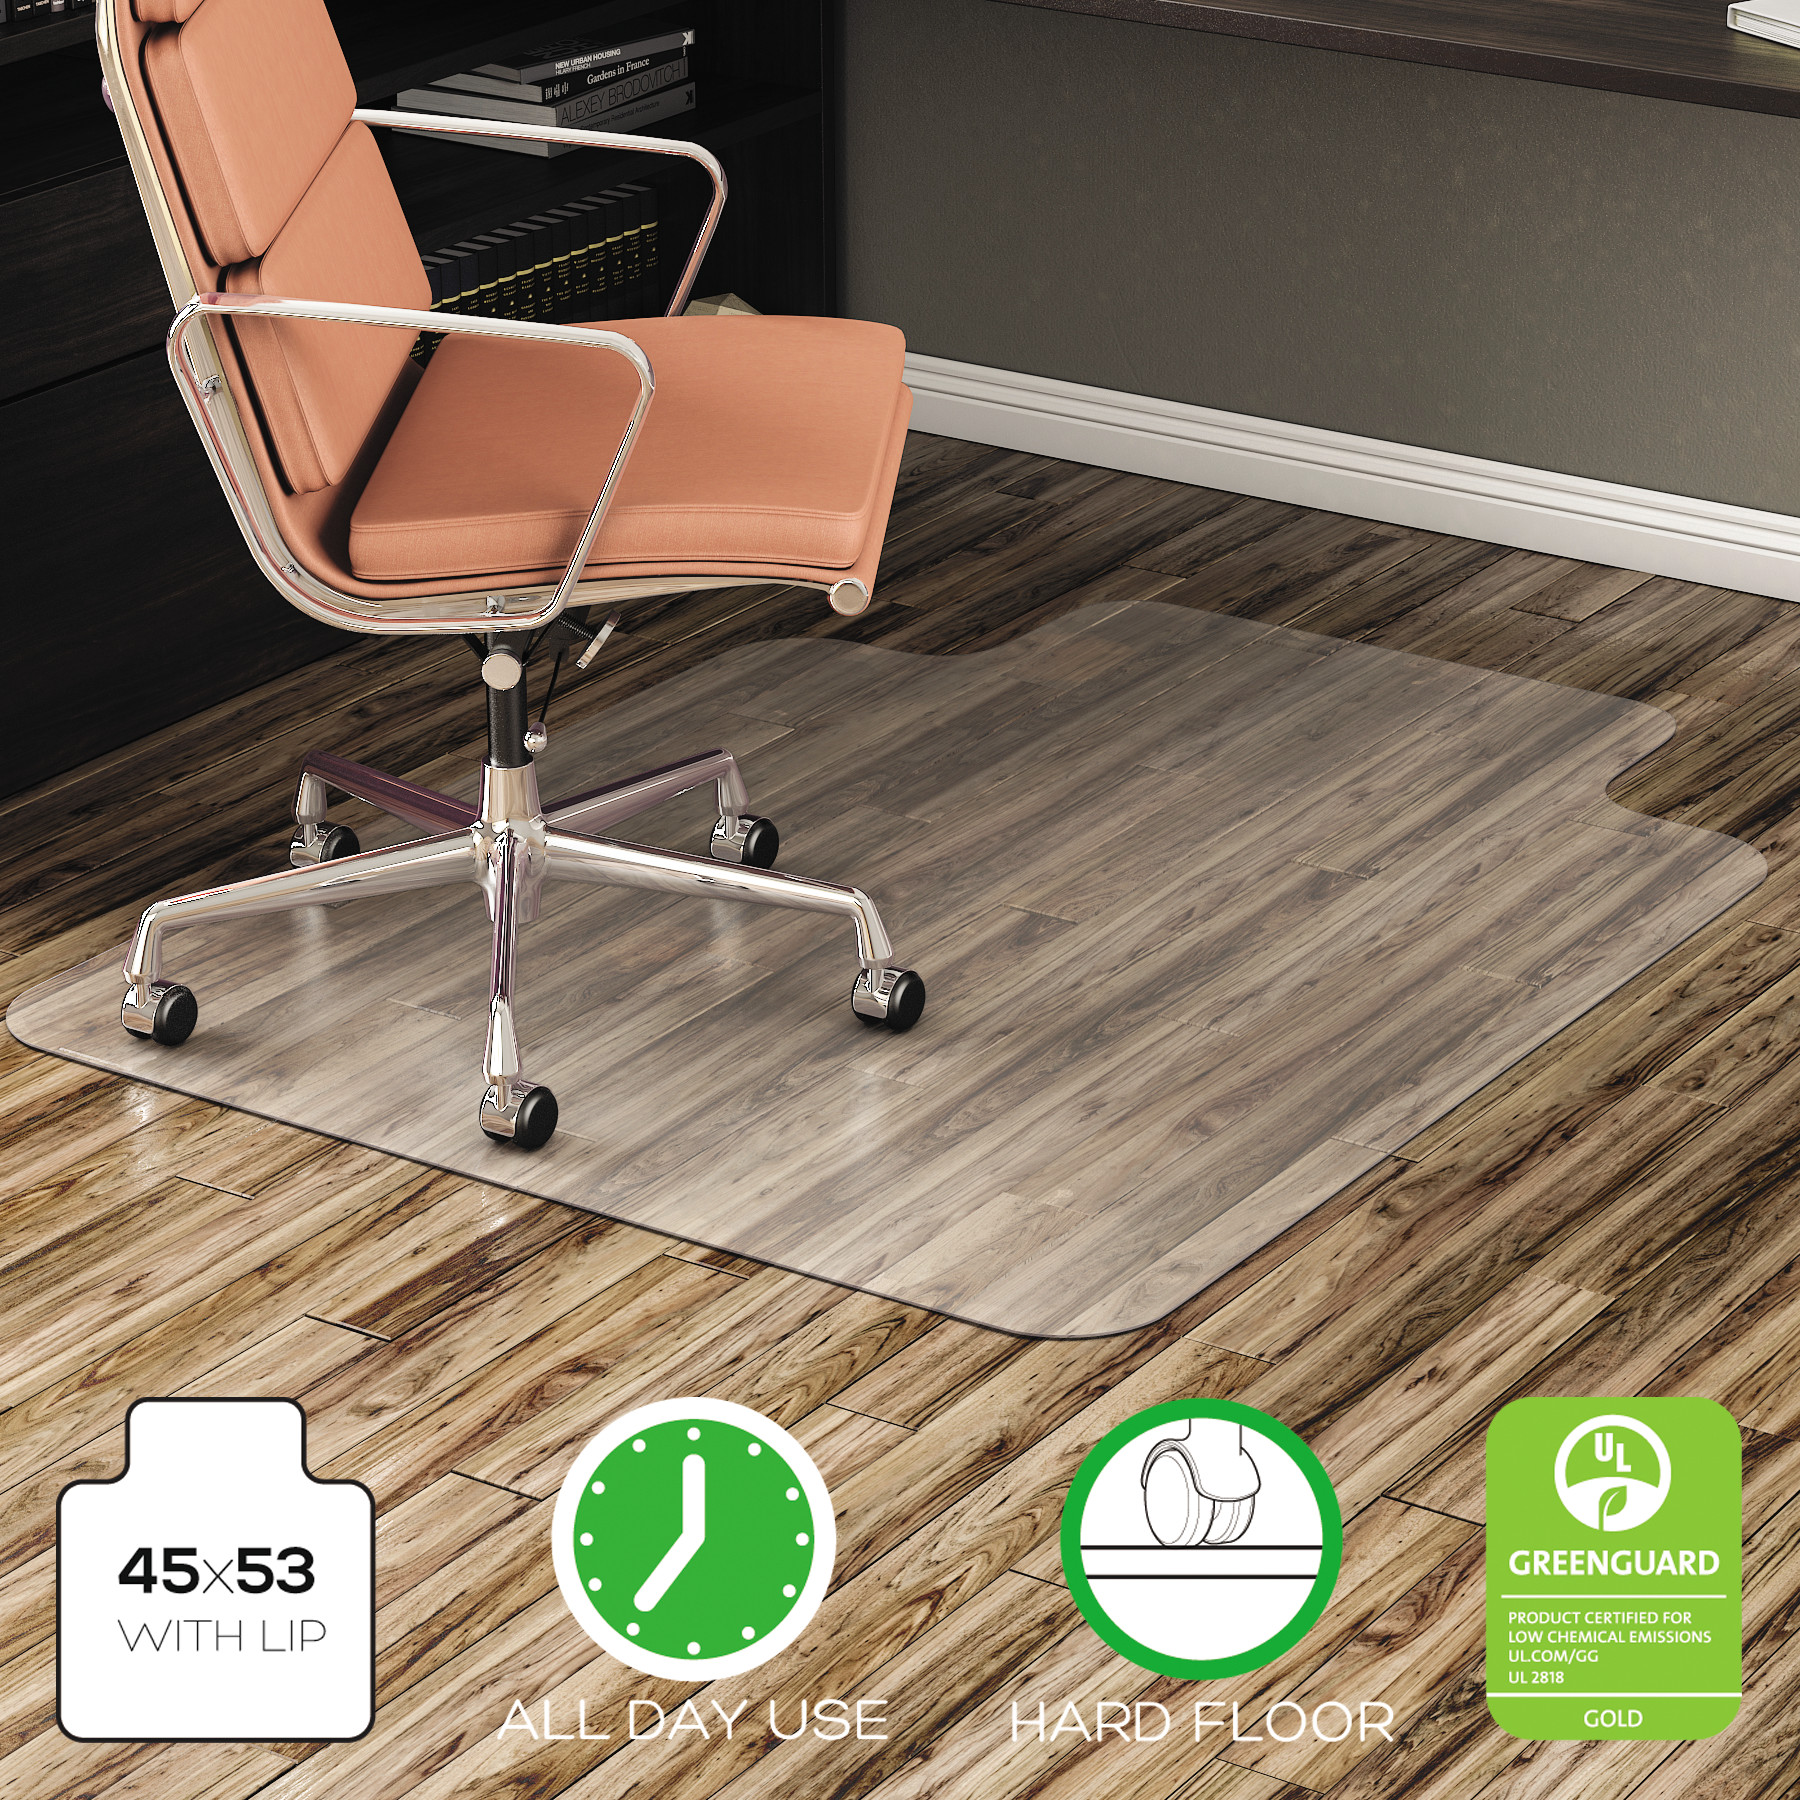 Deflecto EconoMat 45 x 53 Chair Mat for Hard Floor, Rectangular with Lip